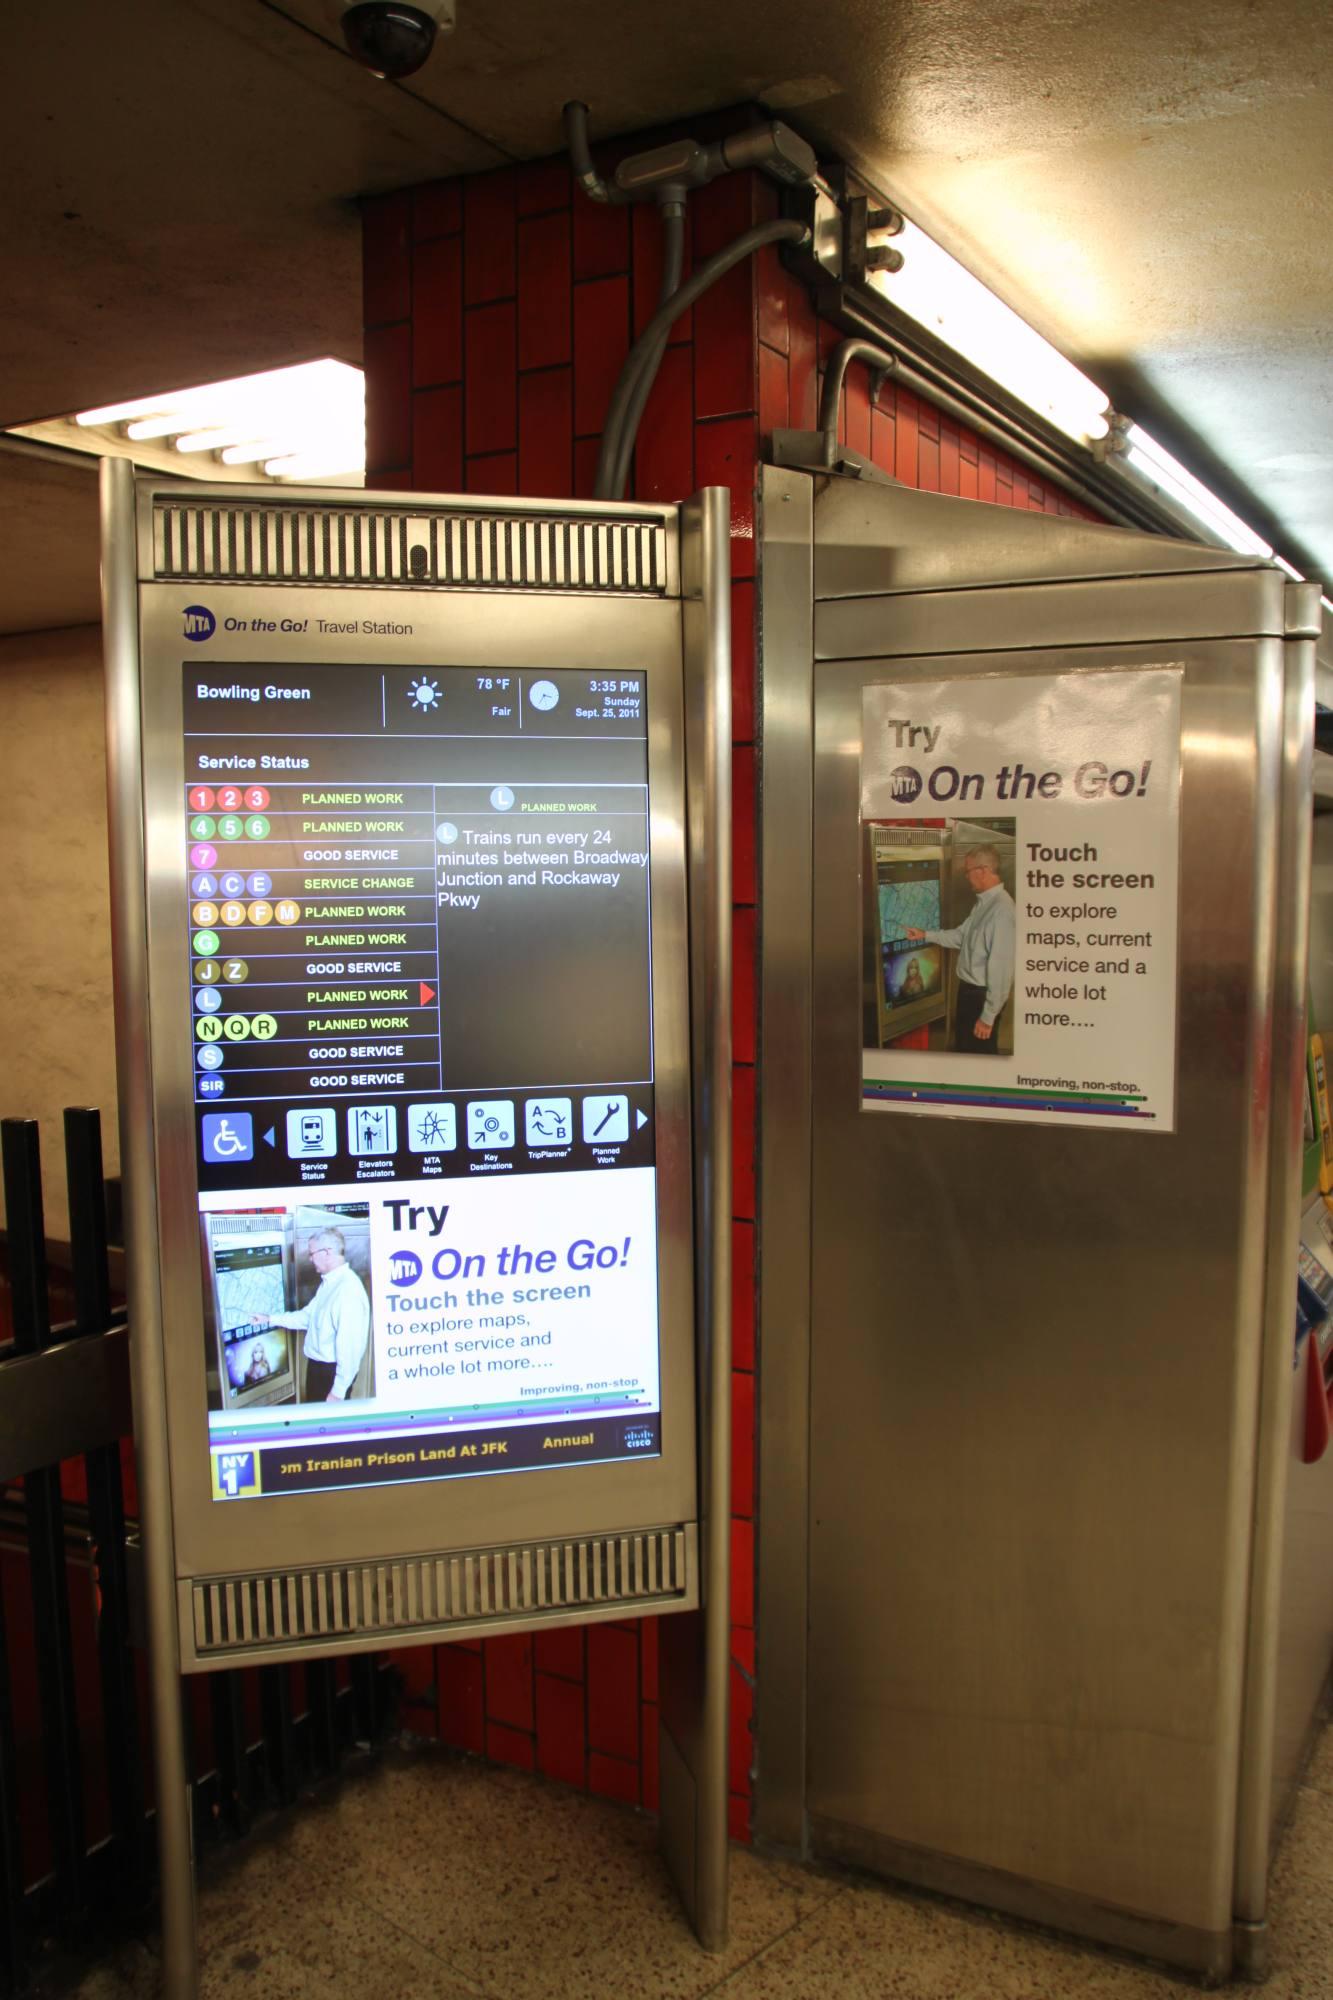 (243k, 1333x2000)<br><b>Country:</b> United States<br><b>City:</b> New York<br><b>System:</b> New York City Transit<br><b>Line:</b> IRT East Side Line<br><b>Location:</b> Bowling Green<br><b>Photo by:</b> Robbie Rosenfeld<br><b>Date:</b> 9/25/2011<br><b>Notes:</b> New On the Go kiosk.<br><b>Viewed (this week/total):</b> 0 / 1459